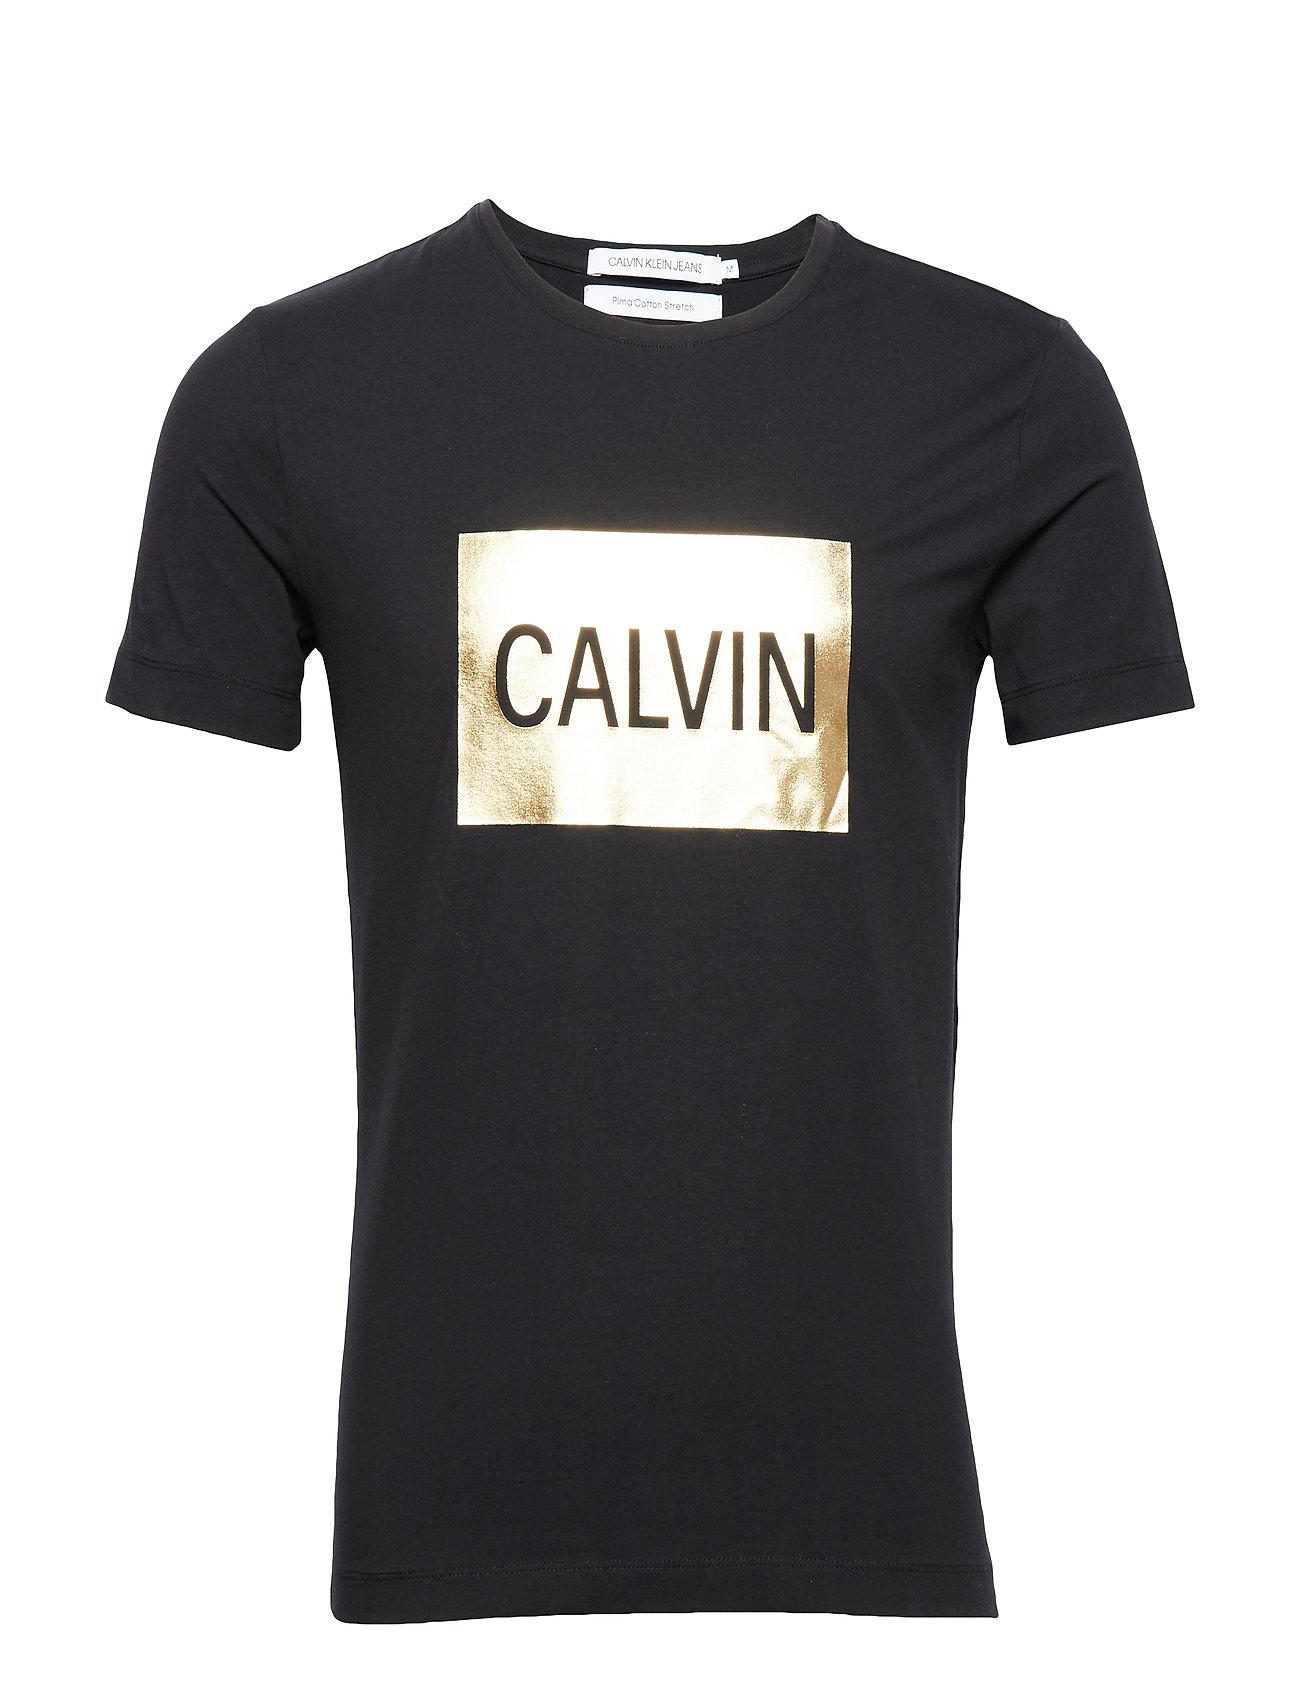 Calvin Klein Jeans CALVIN SLIM SS TEE - CK BLACK / GOLD